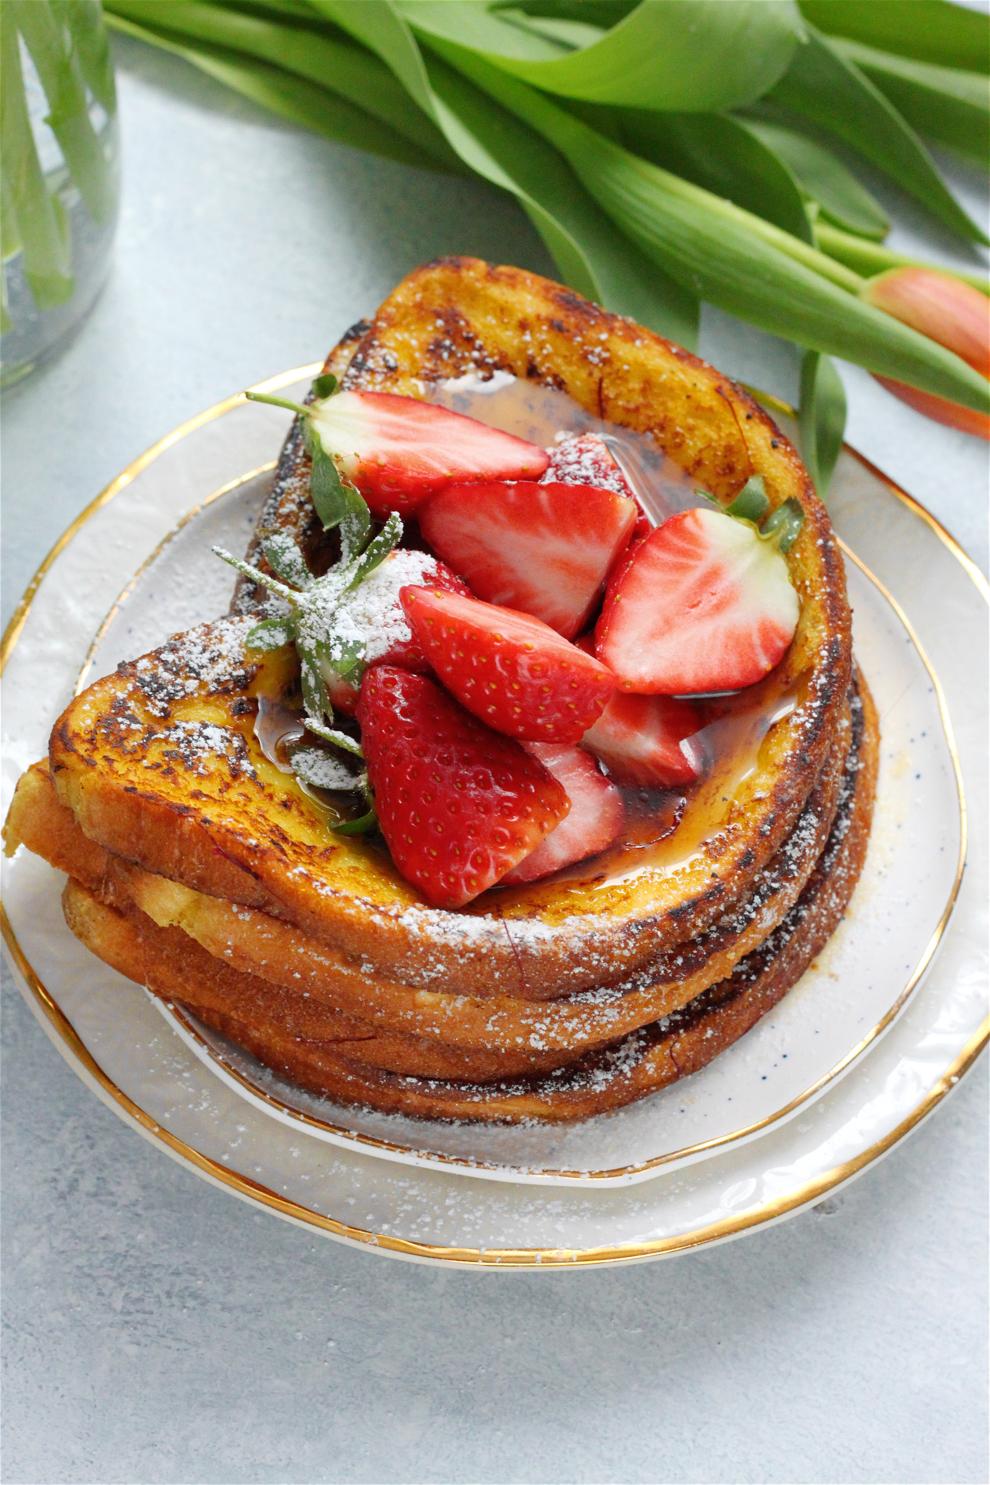 Vegan Cardamom and Saffron French Toast